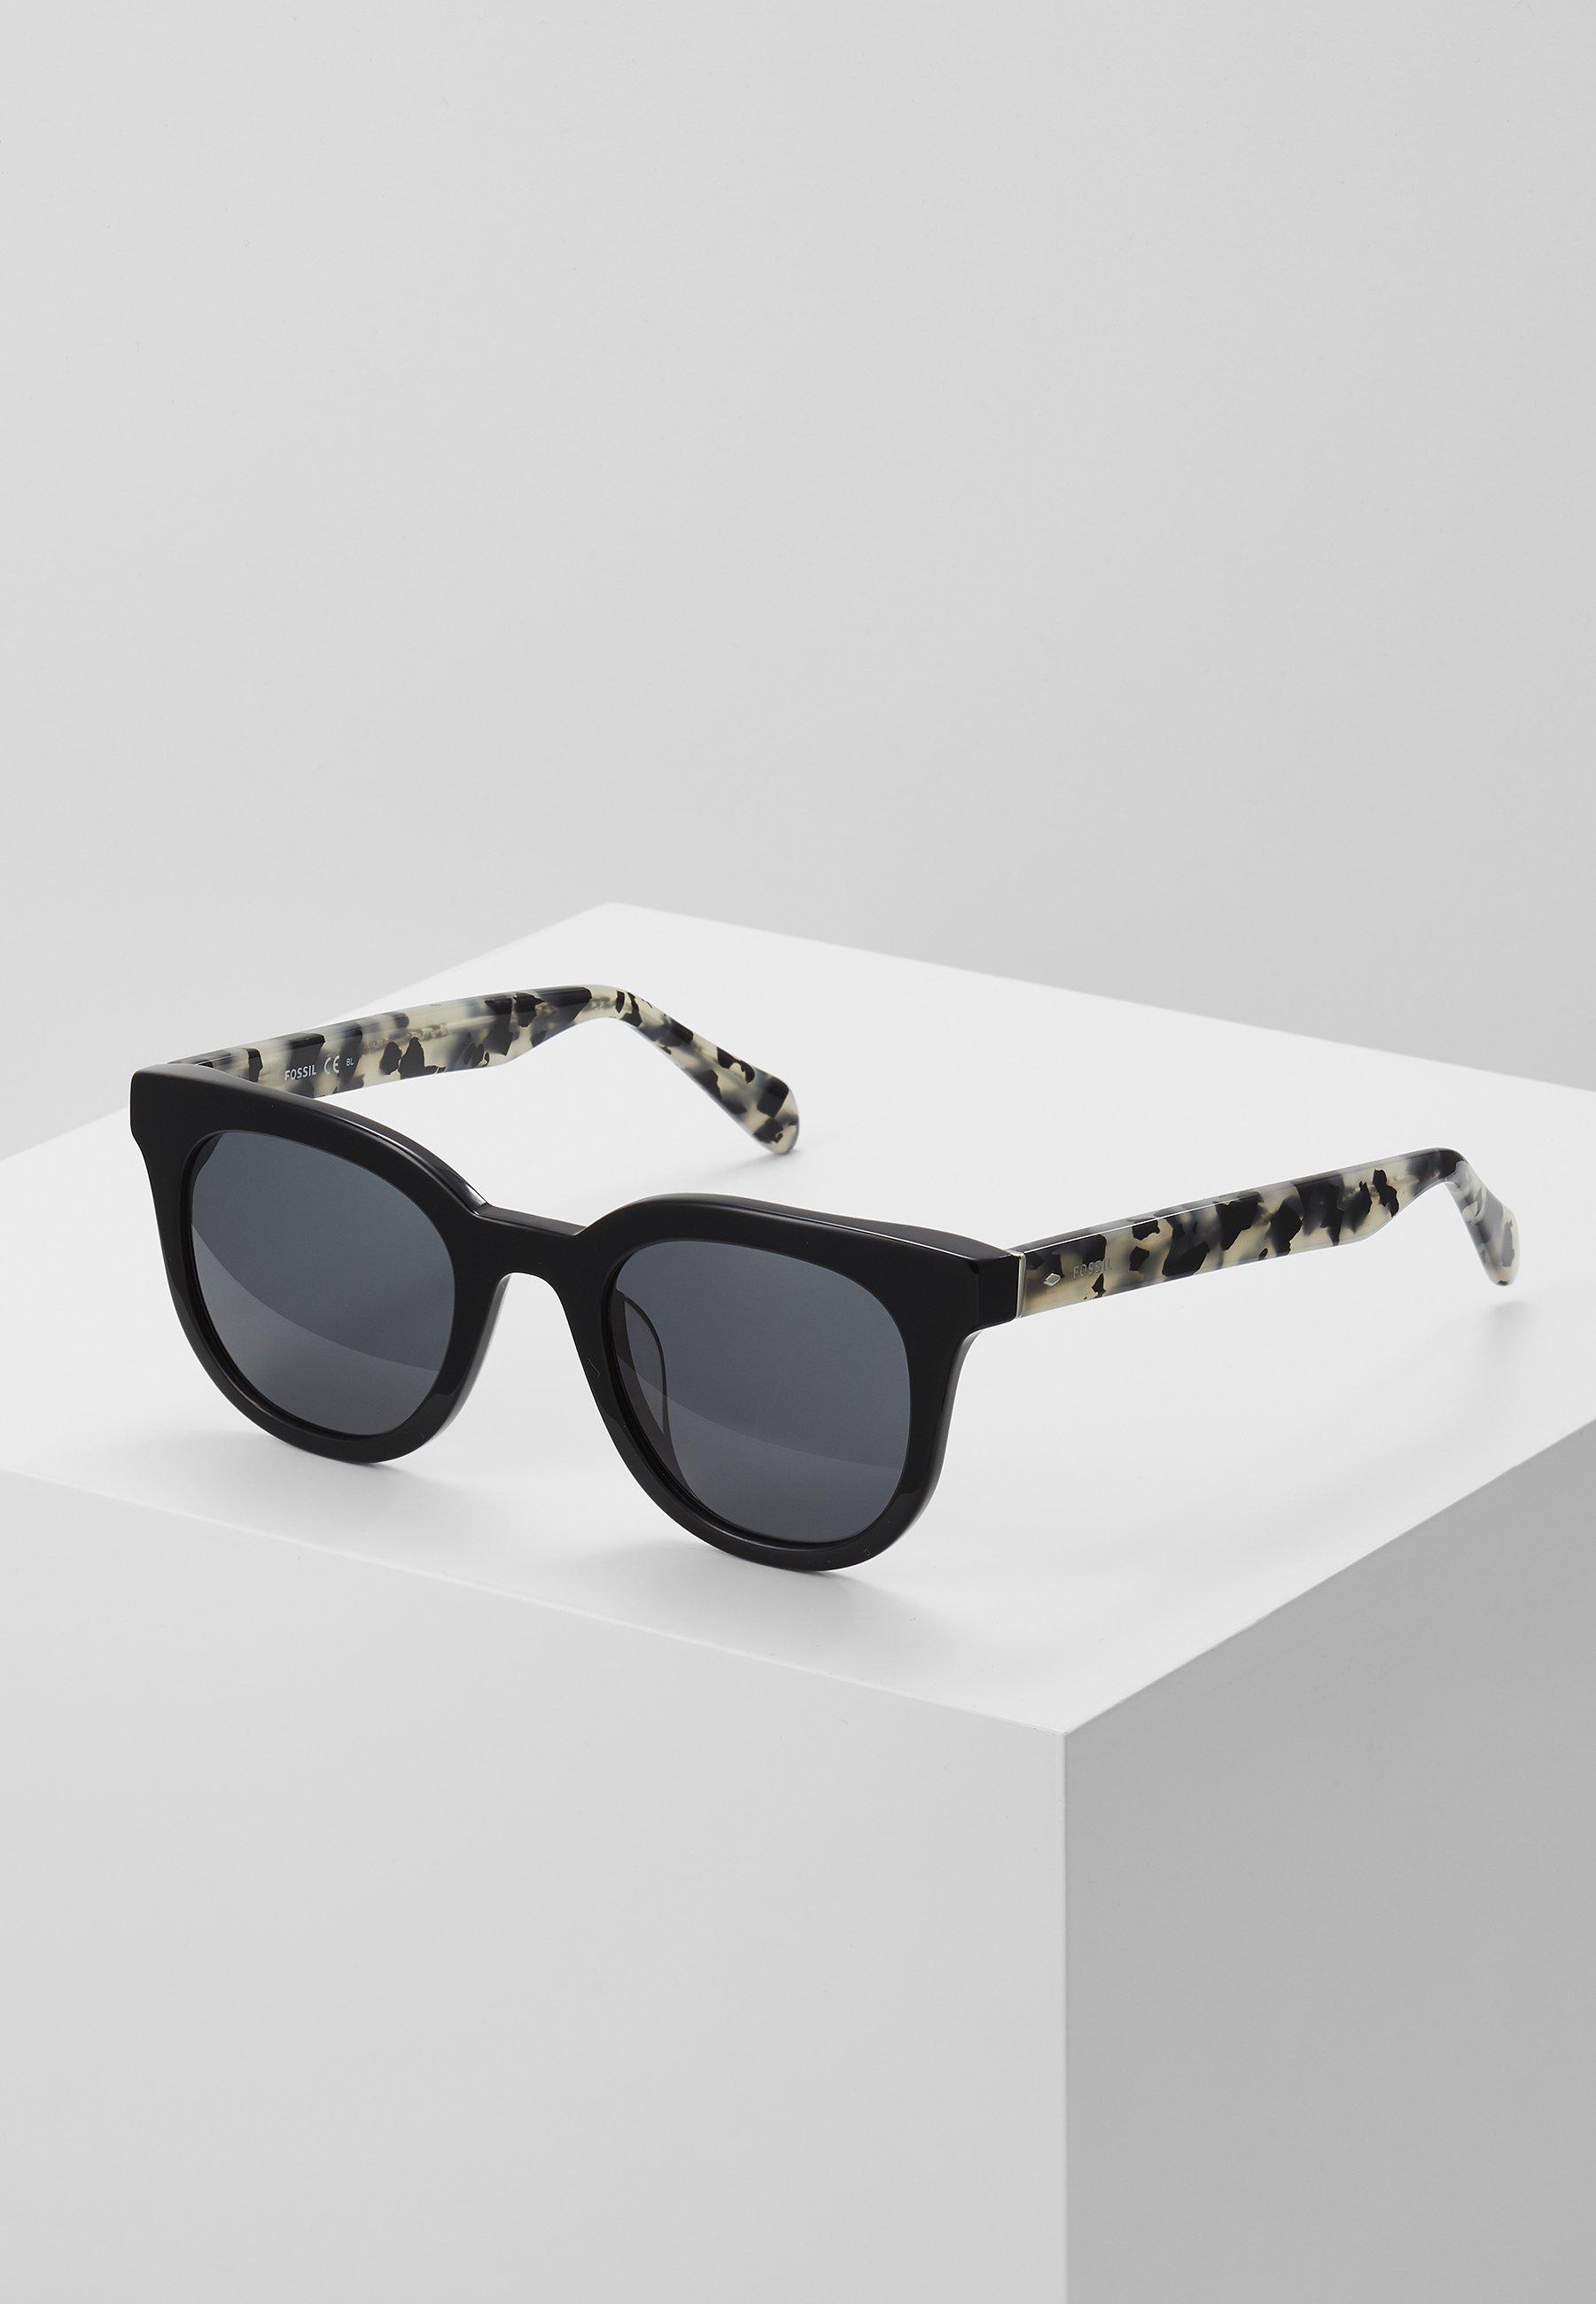 Fossil Sunglasses - black